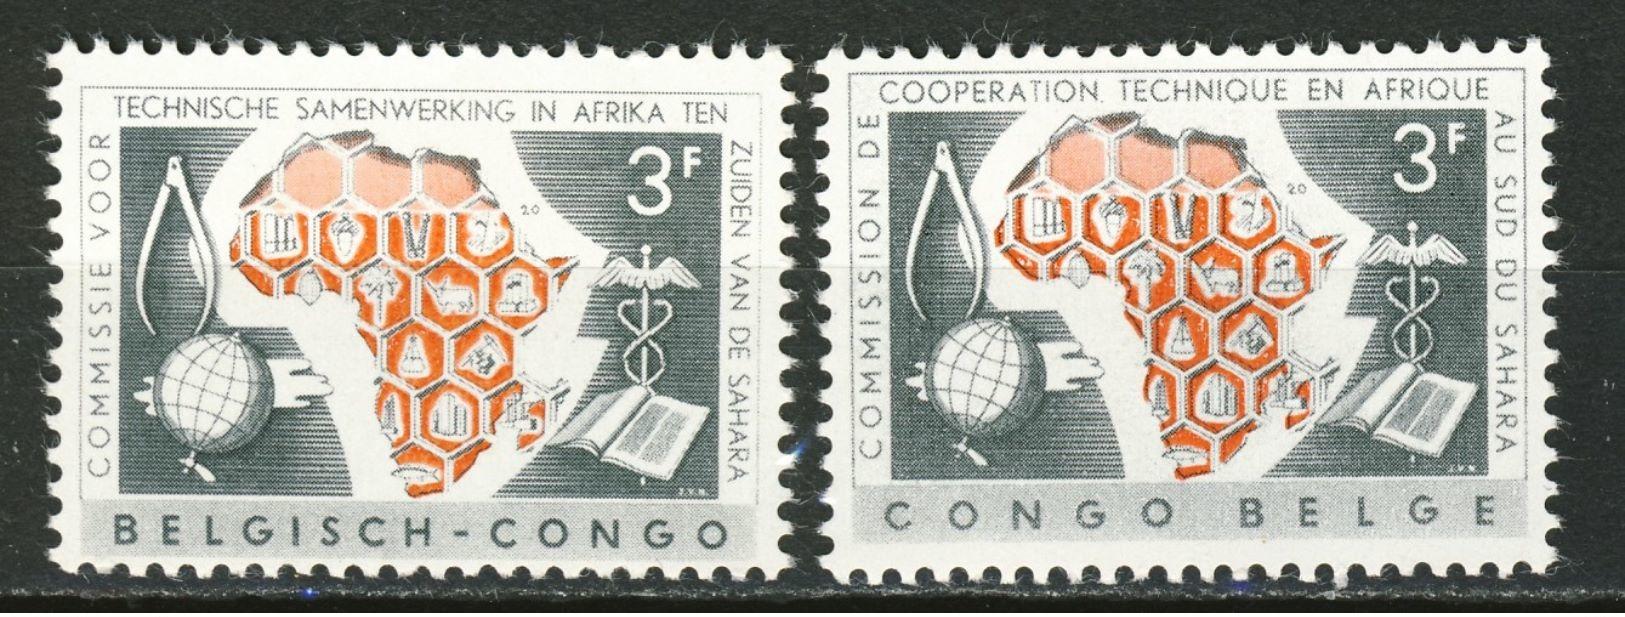 Congo Belge - Belgisch Kongo Nr 365-366  Neufs - Postfris ) MNH  (XX) - 1947-60: Neufs